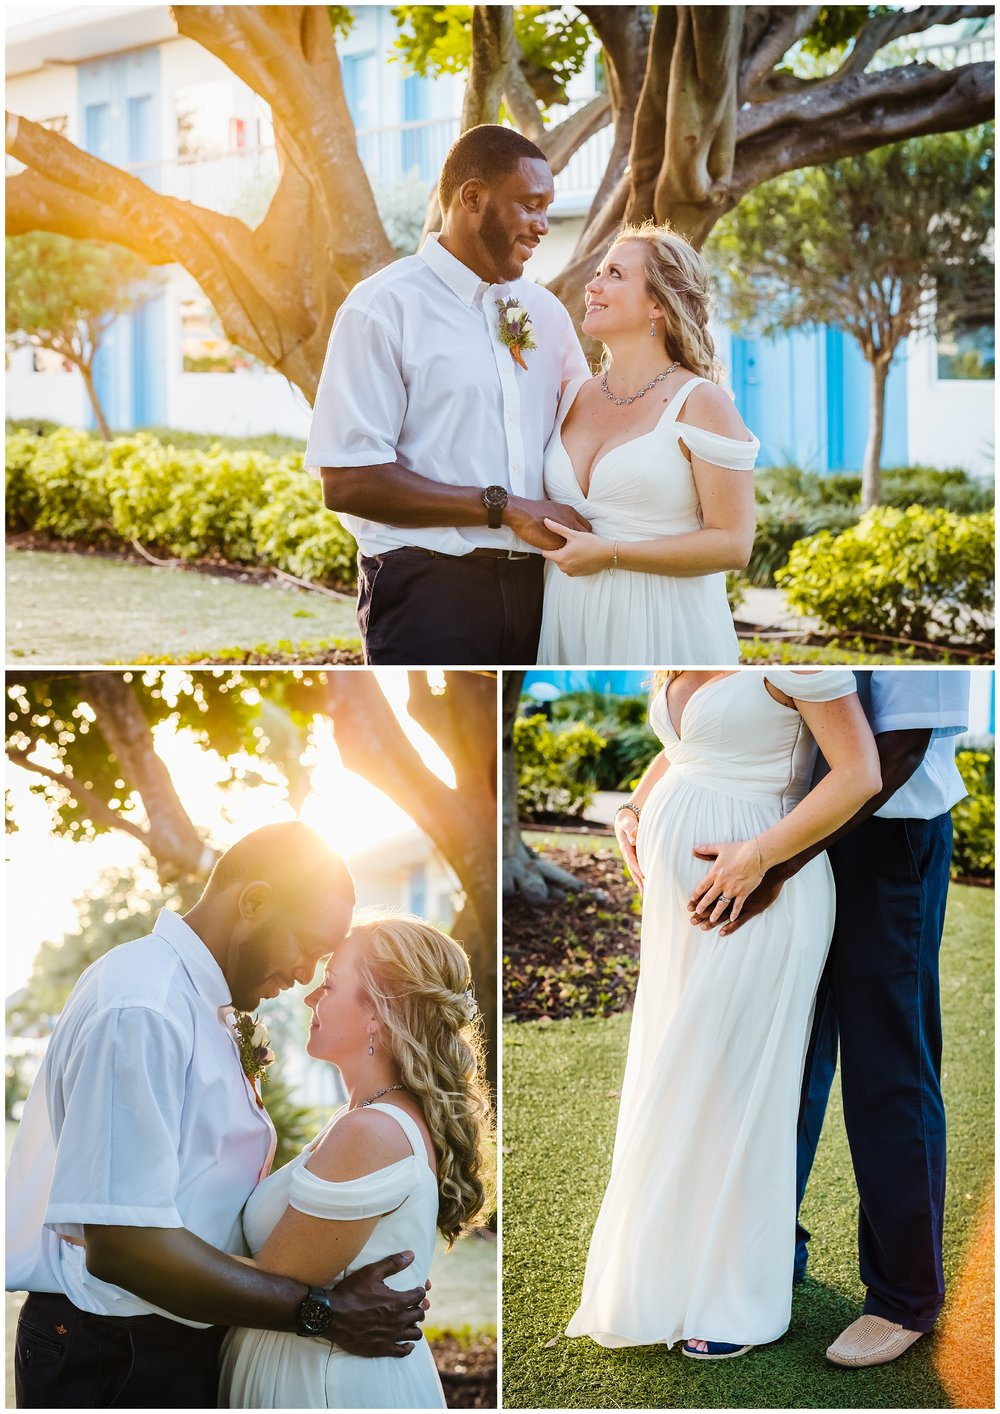 post-card-inn-wedding-photographer-twins-beach-bubbles_0021.jpg